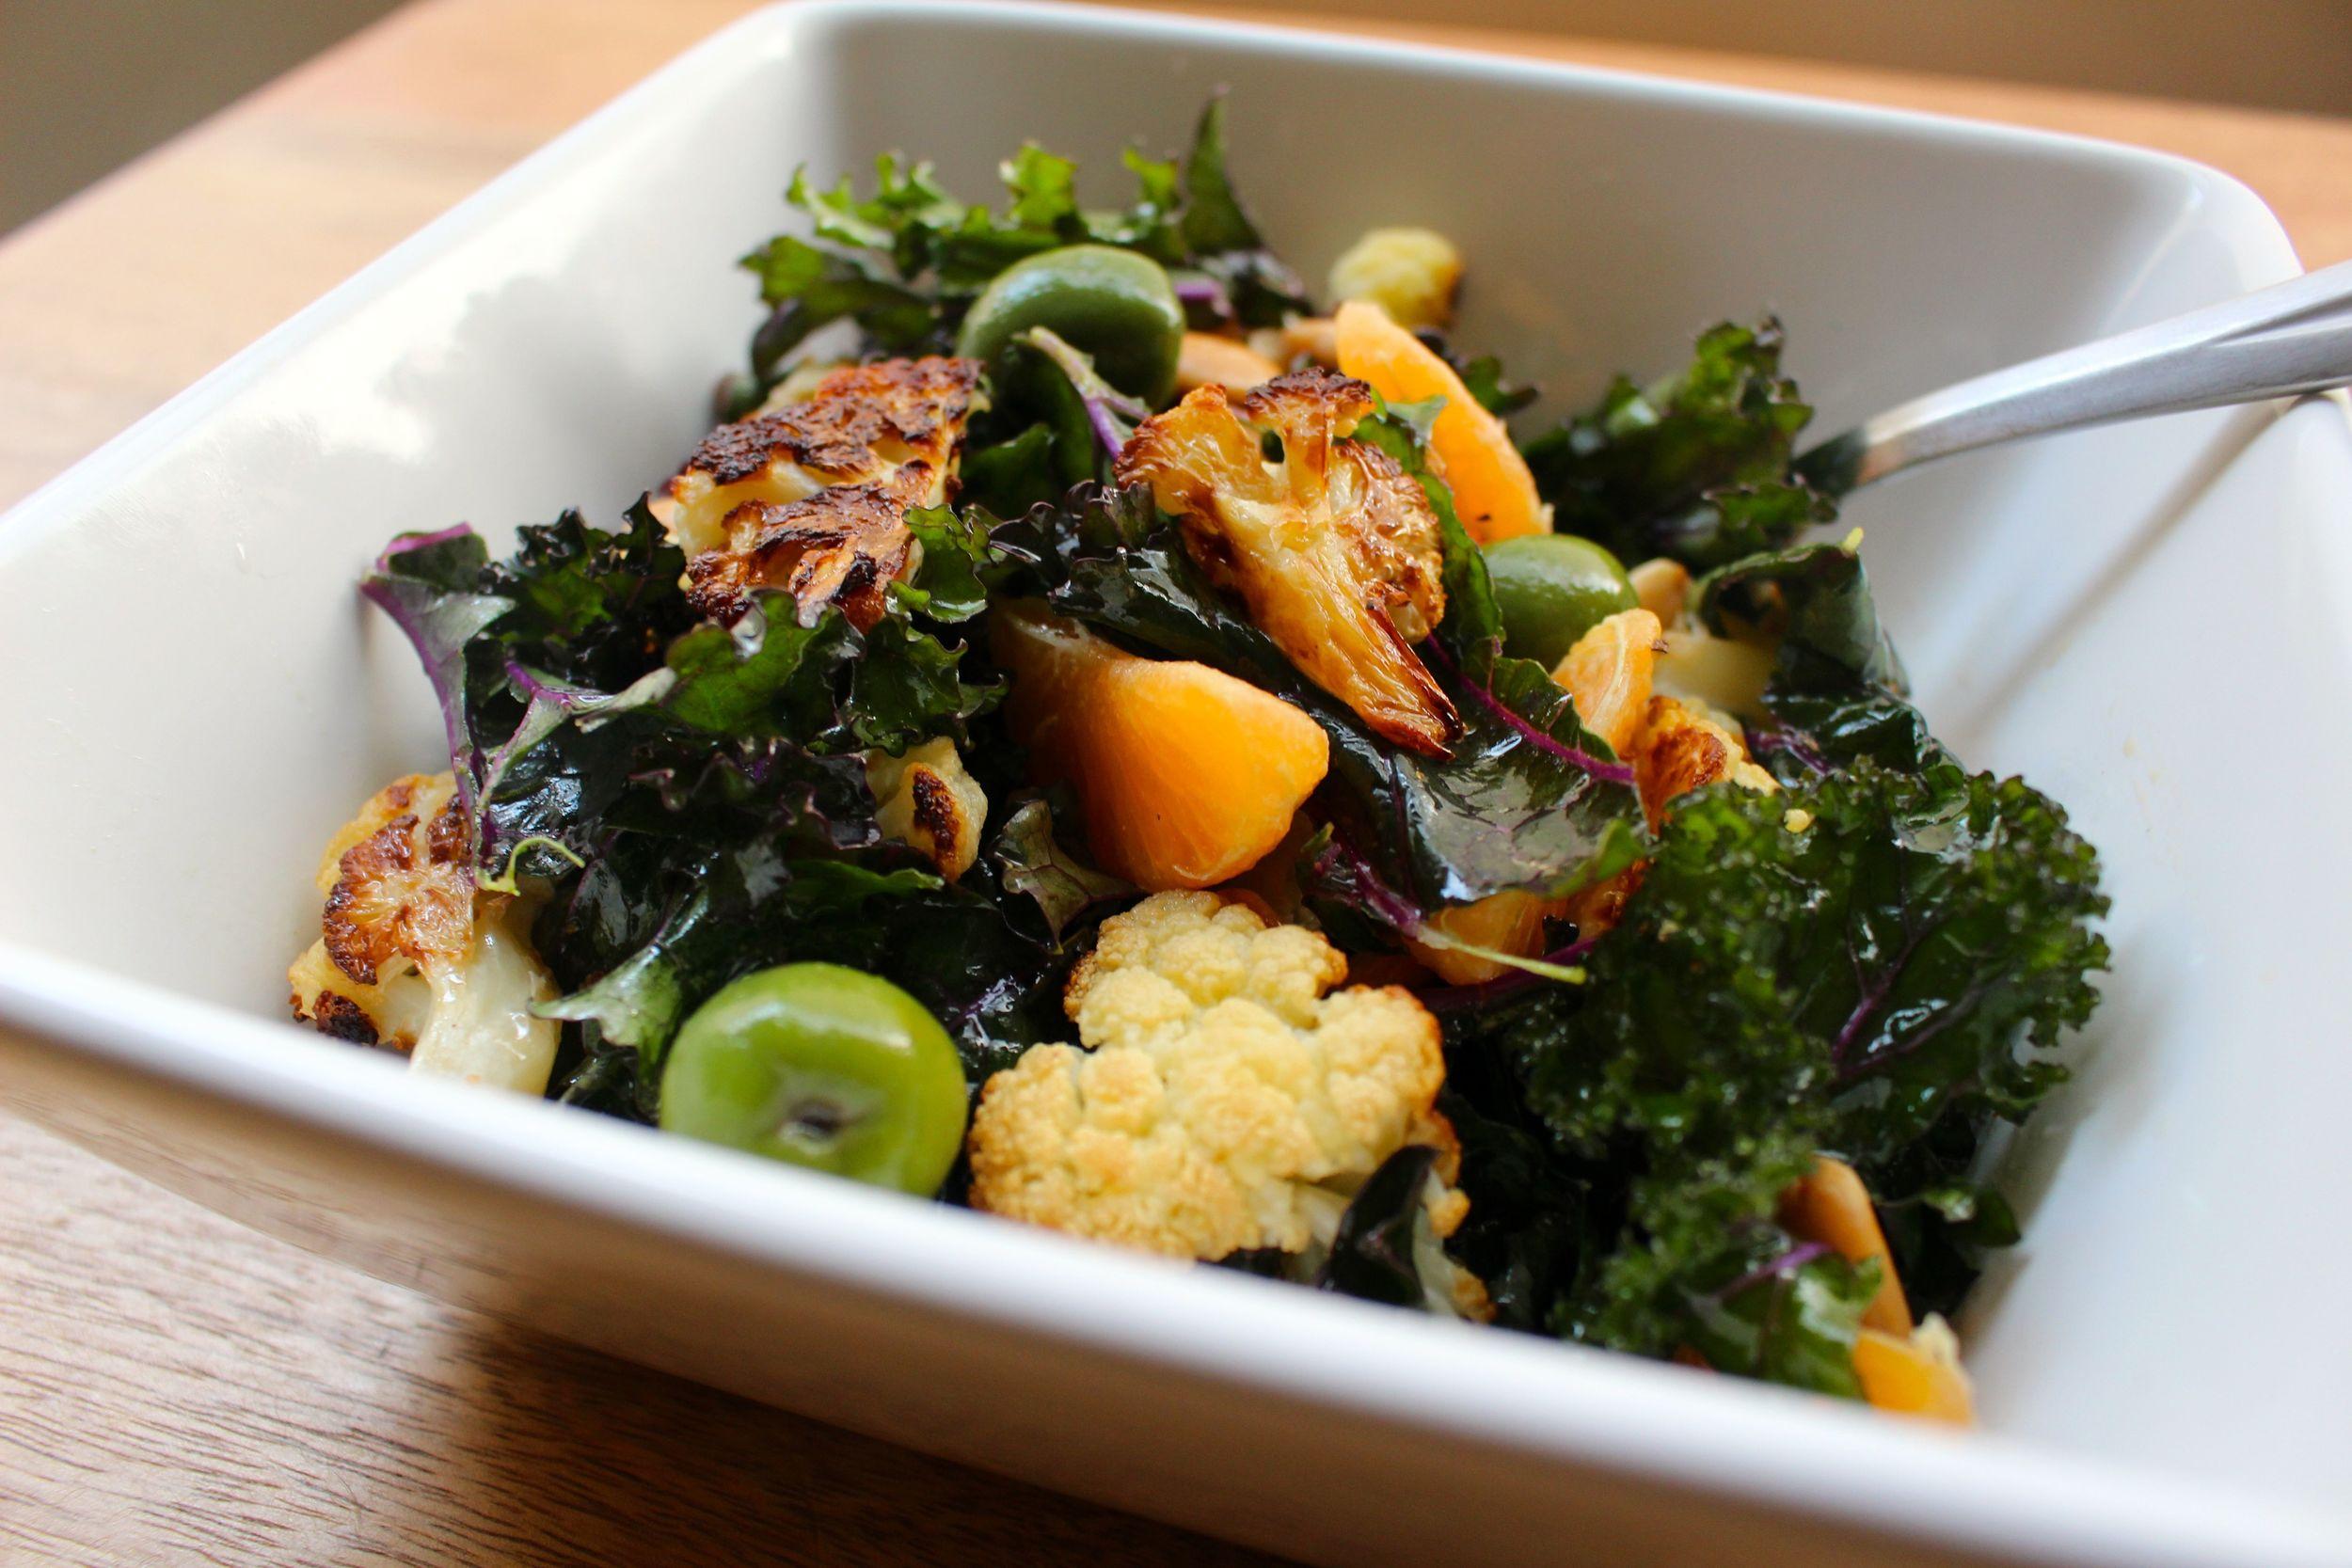 Spanish Kale and Cauliflower Salad